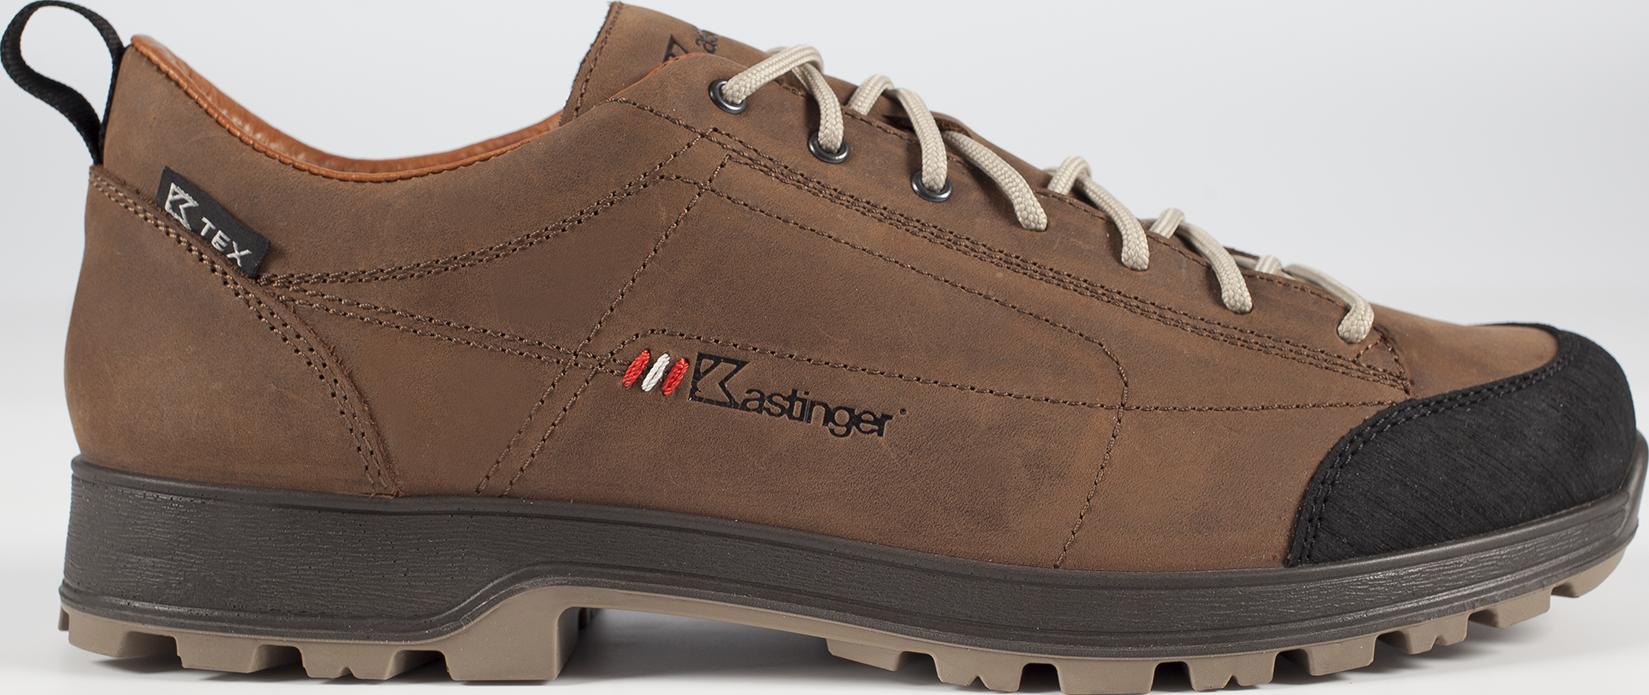 kastinger_12105-300_werbatan_rechts_b